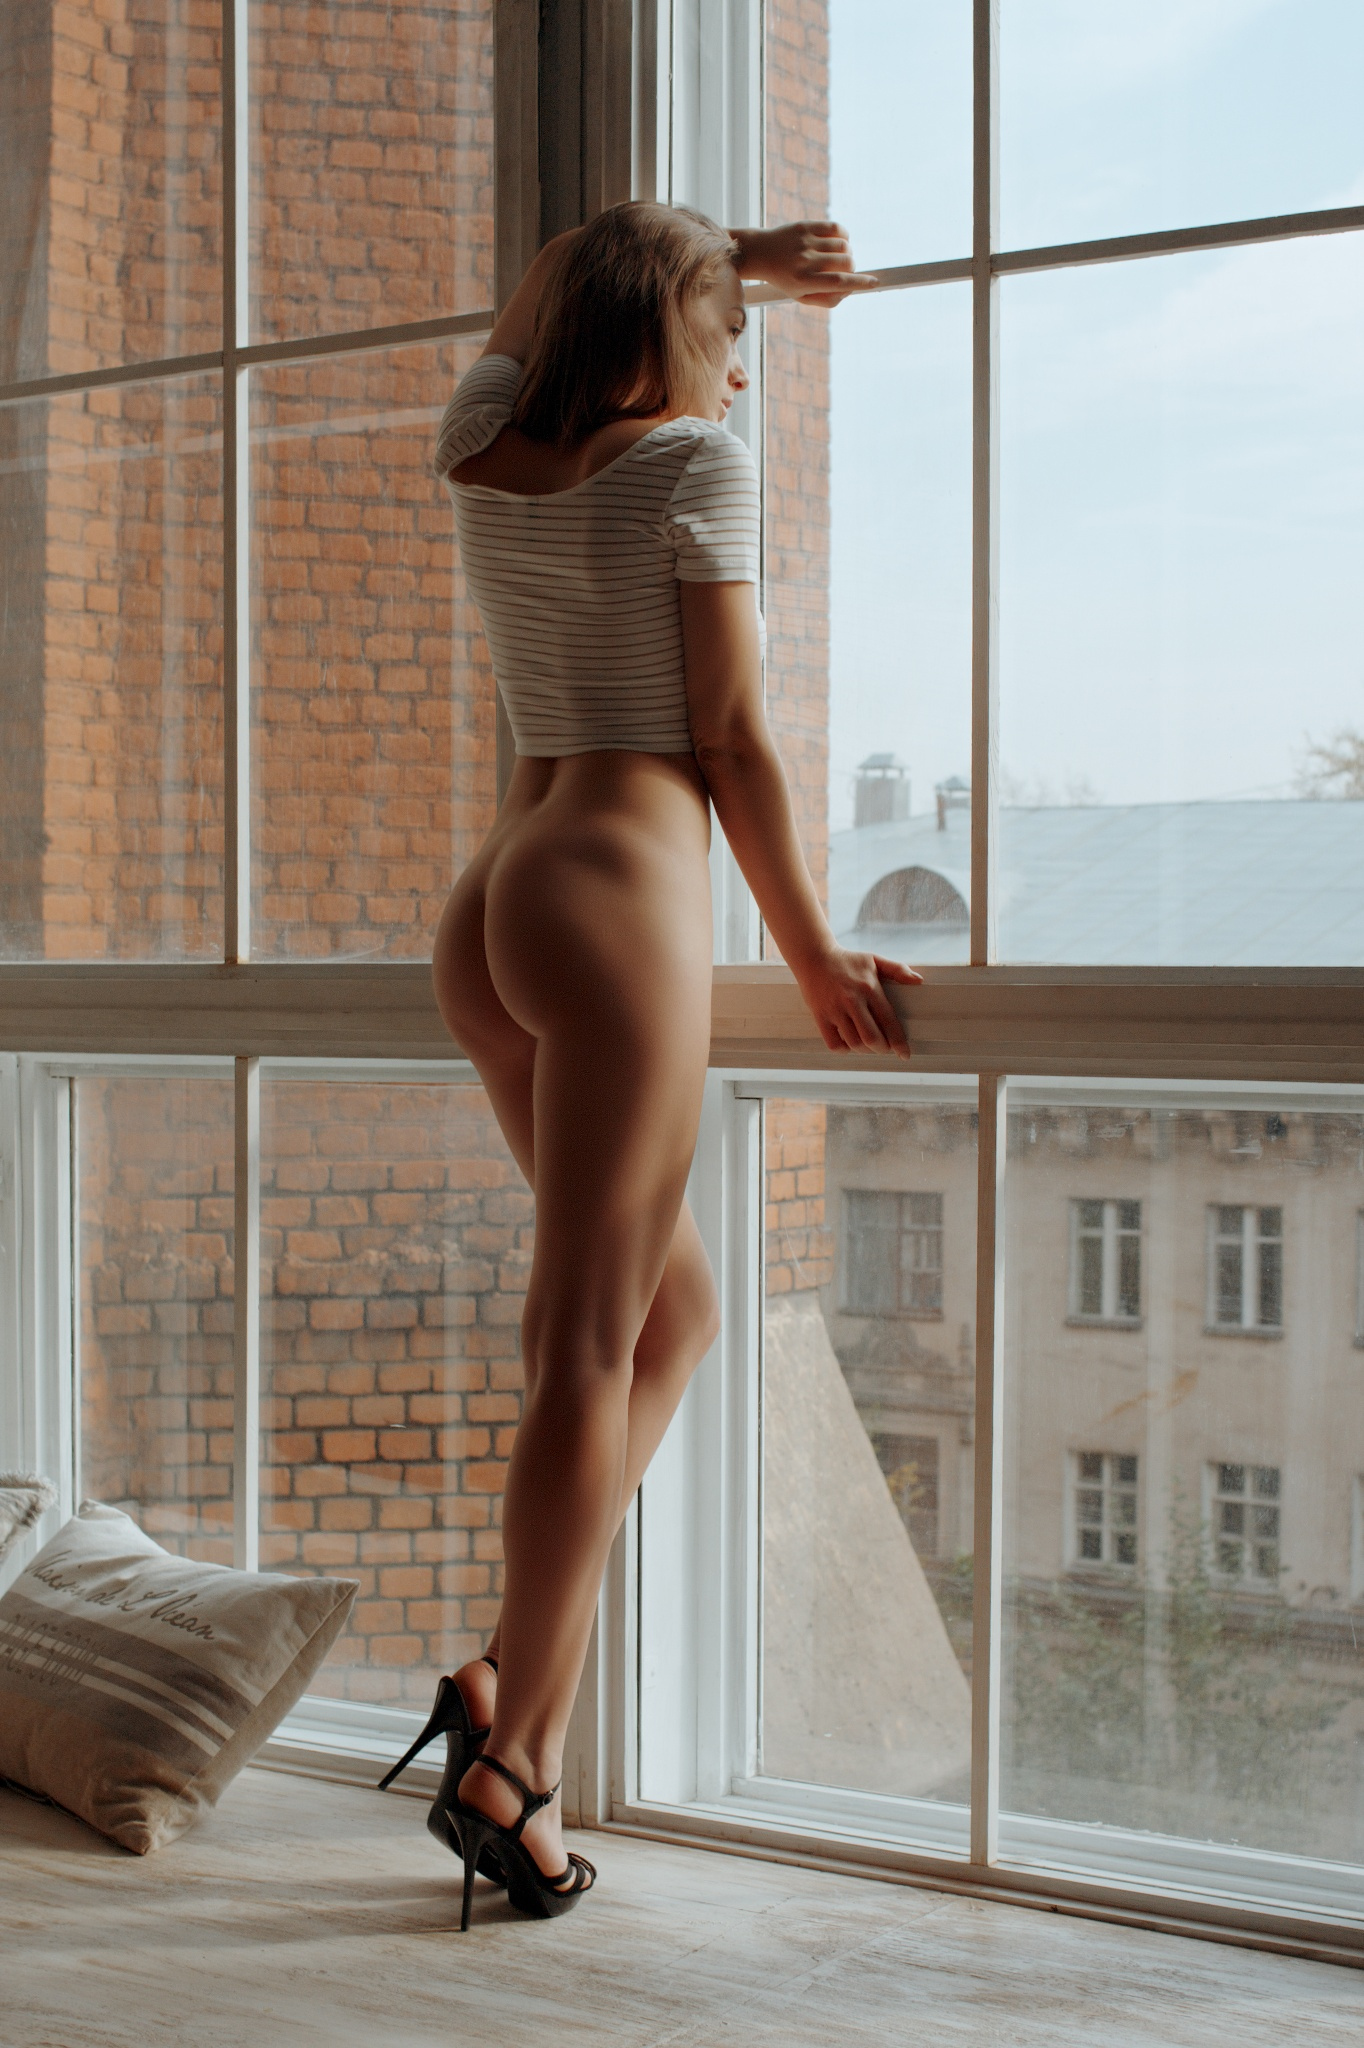 eastern-european-babes-nude